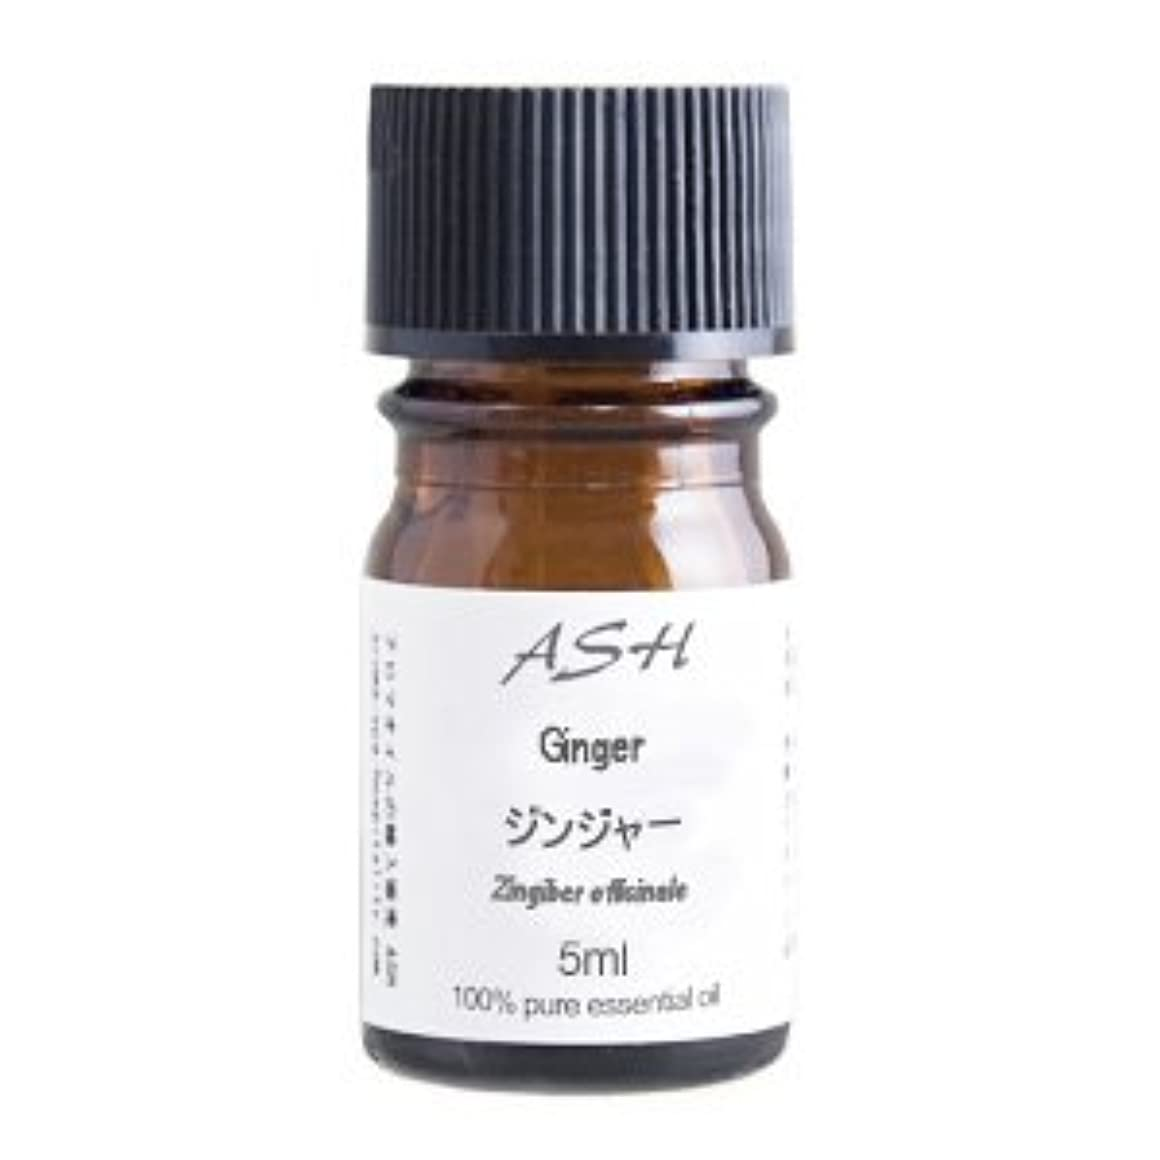 ASH ジンジャー エッセンシャルオイル 5ml AEAJ表示基準適合認定精油